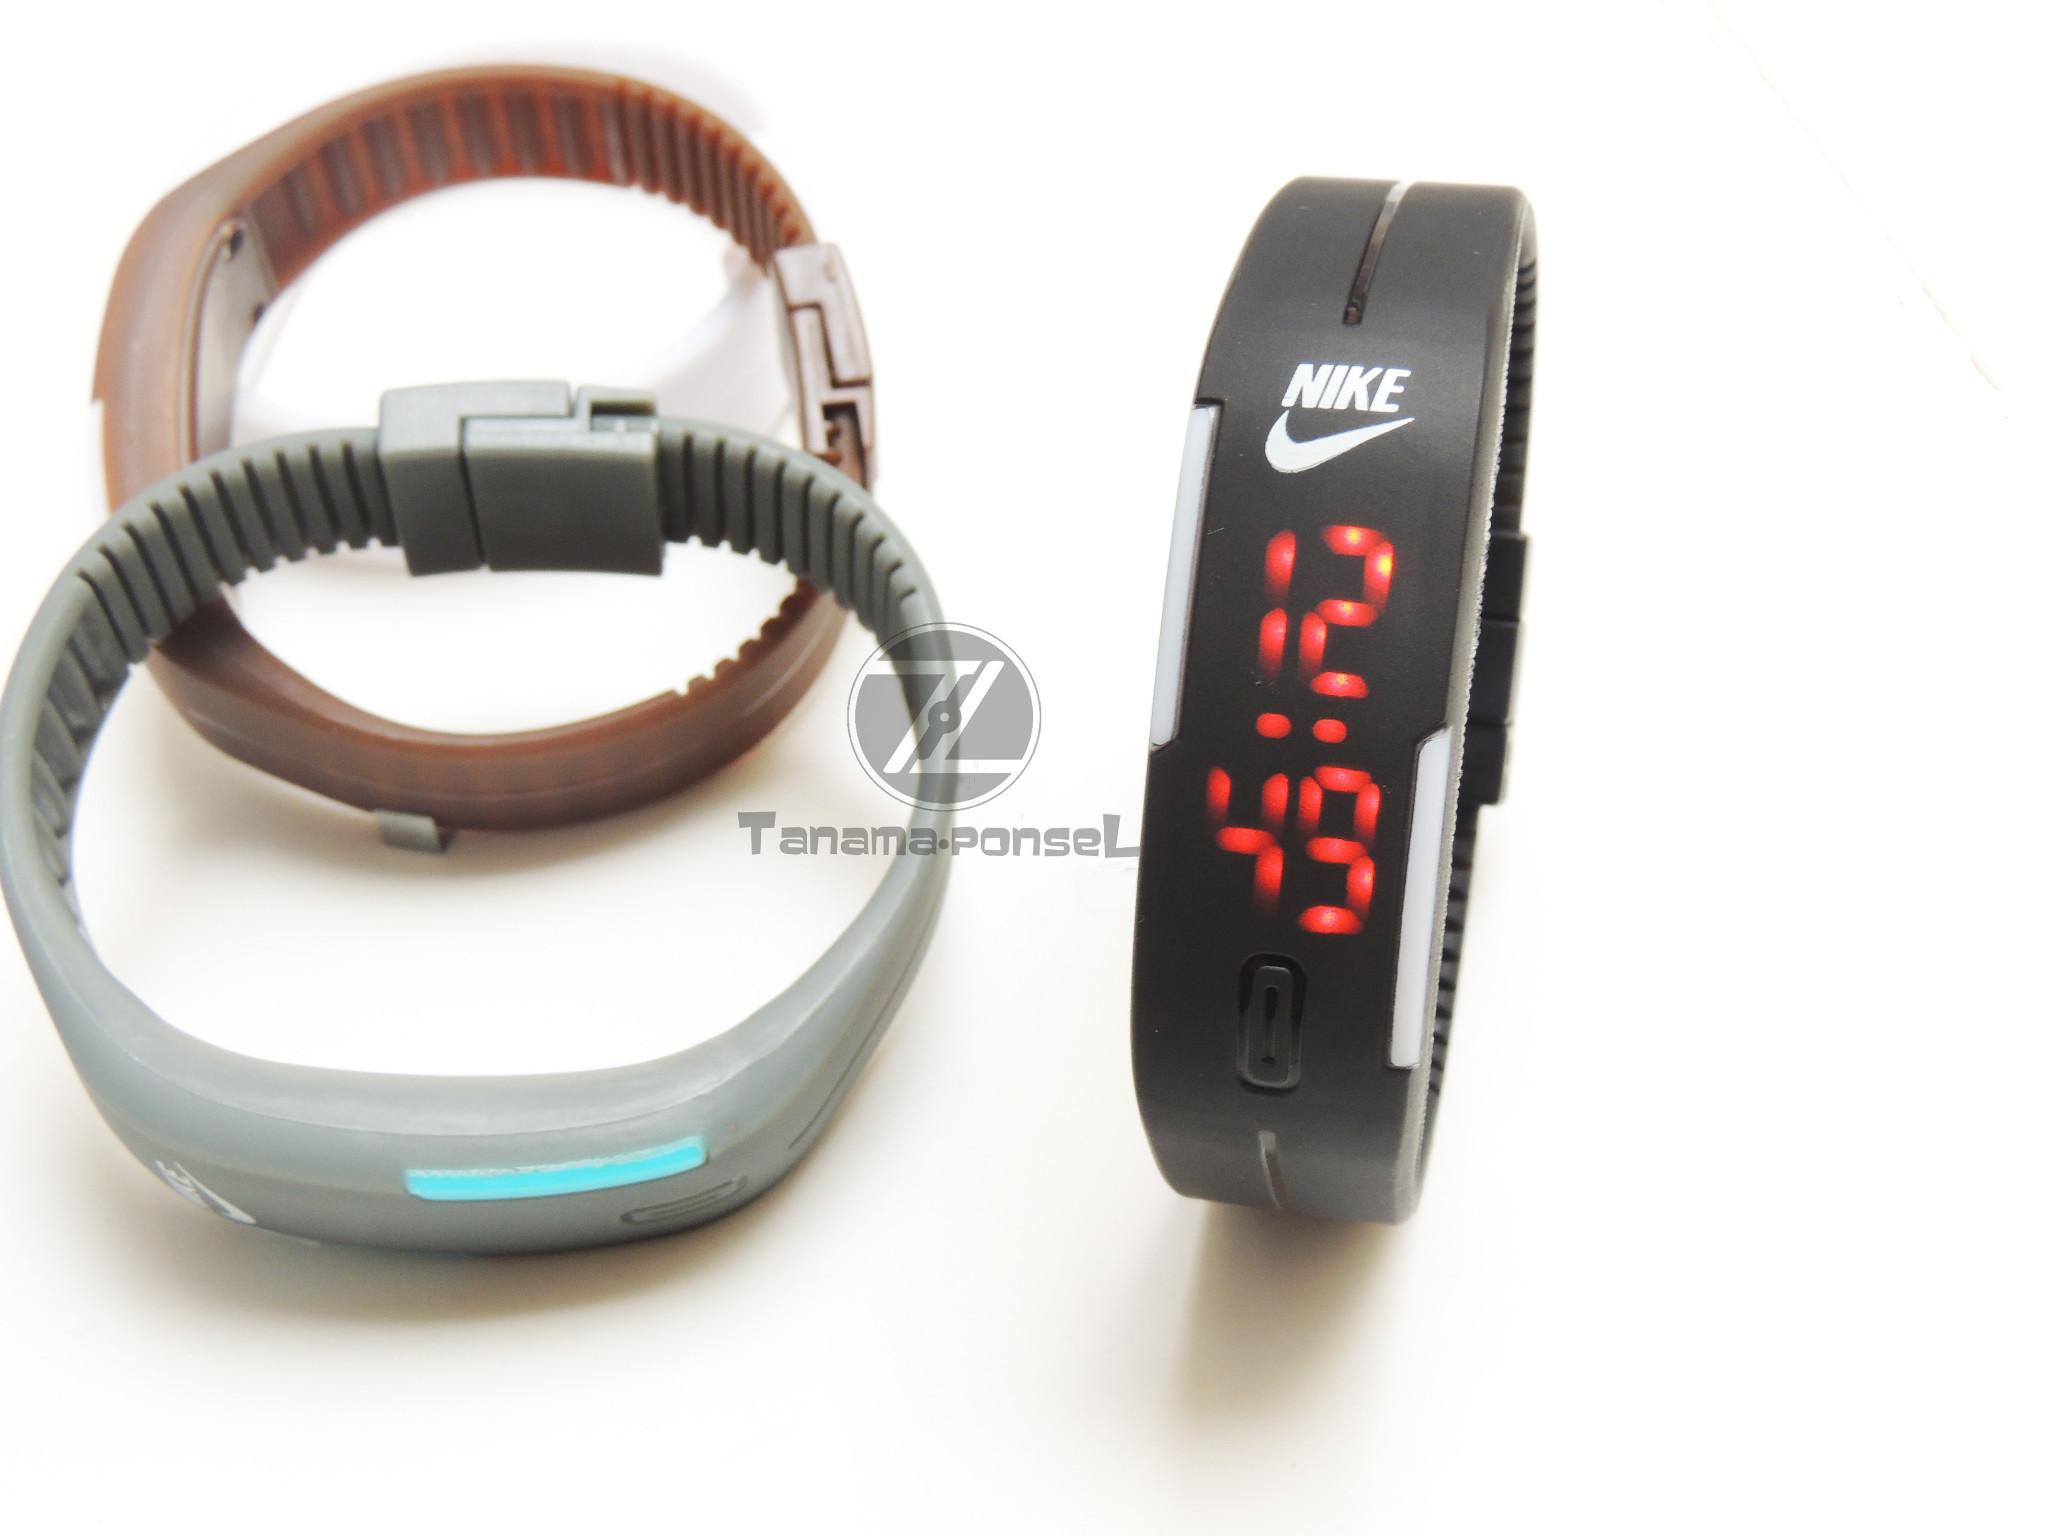 Jual Jam Tangan Gelang LED Nike Adidas Puma Jam LED